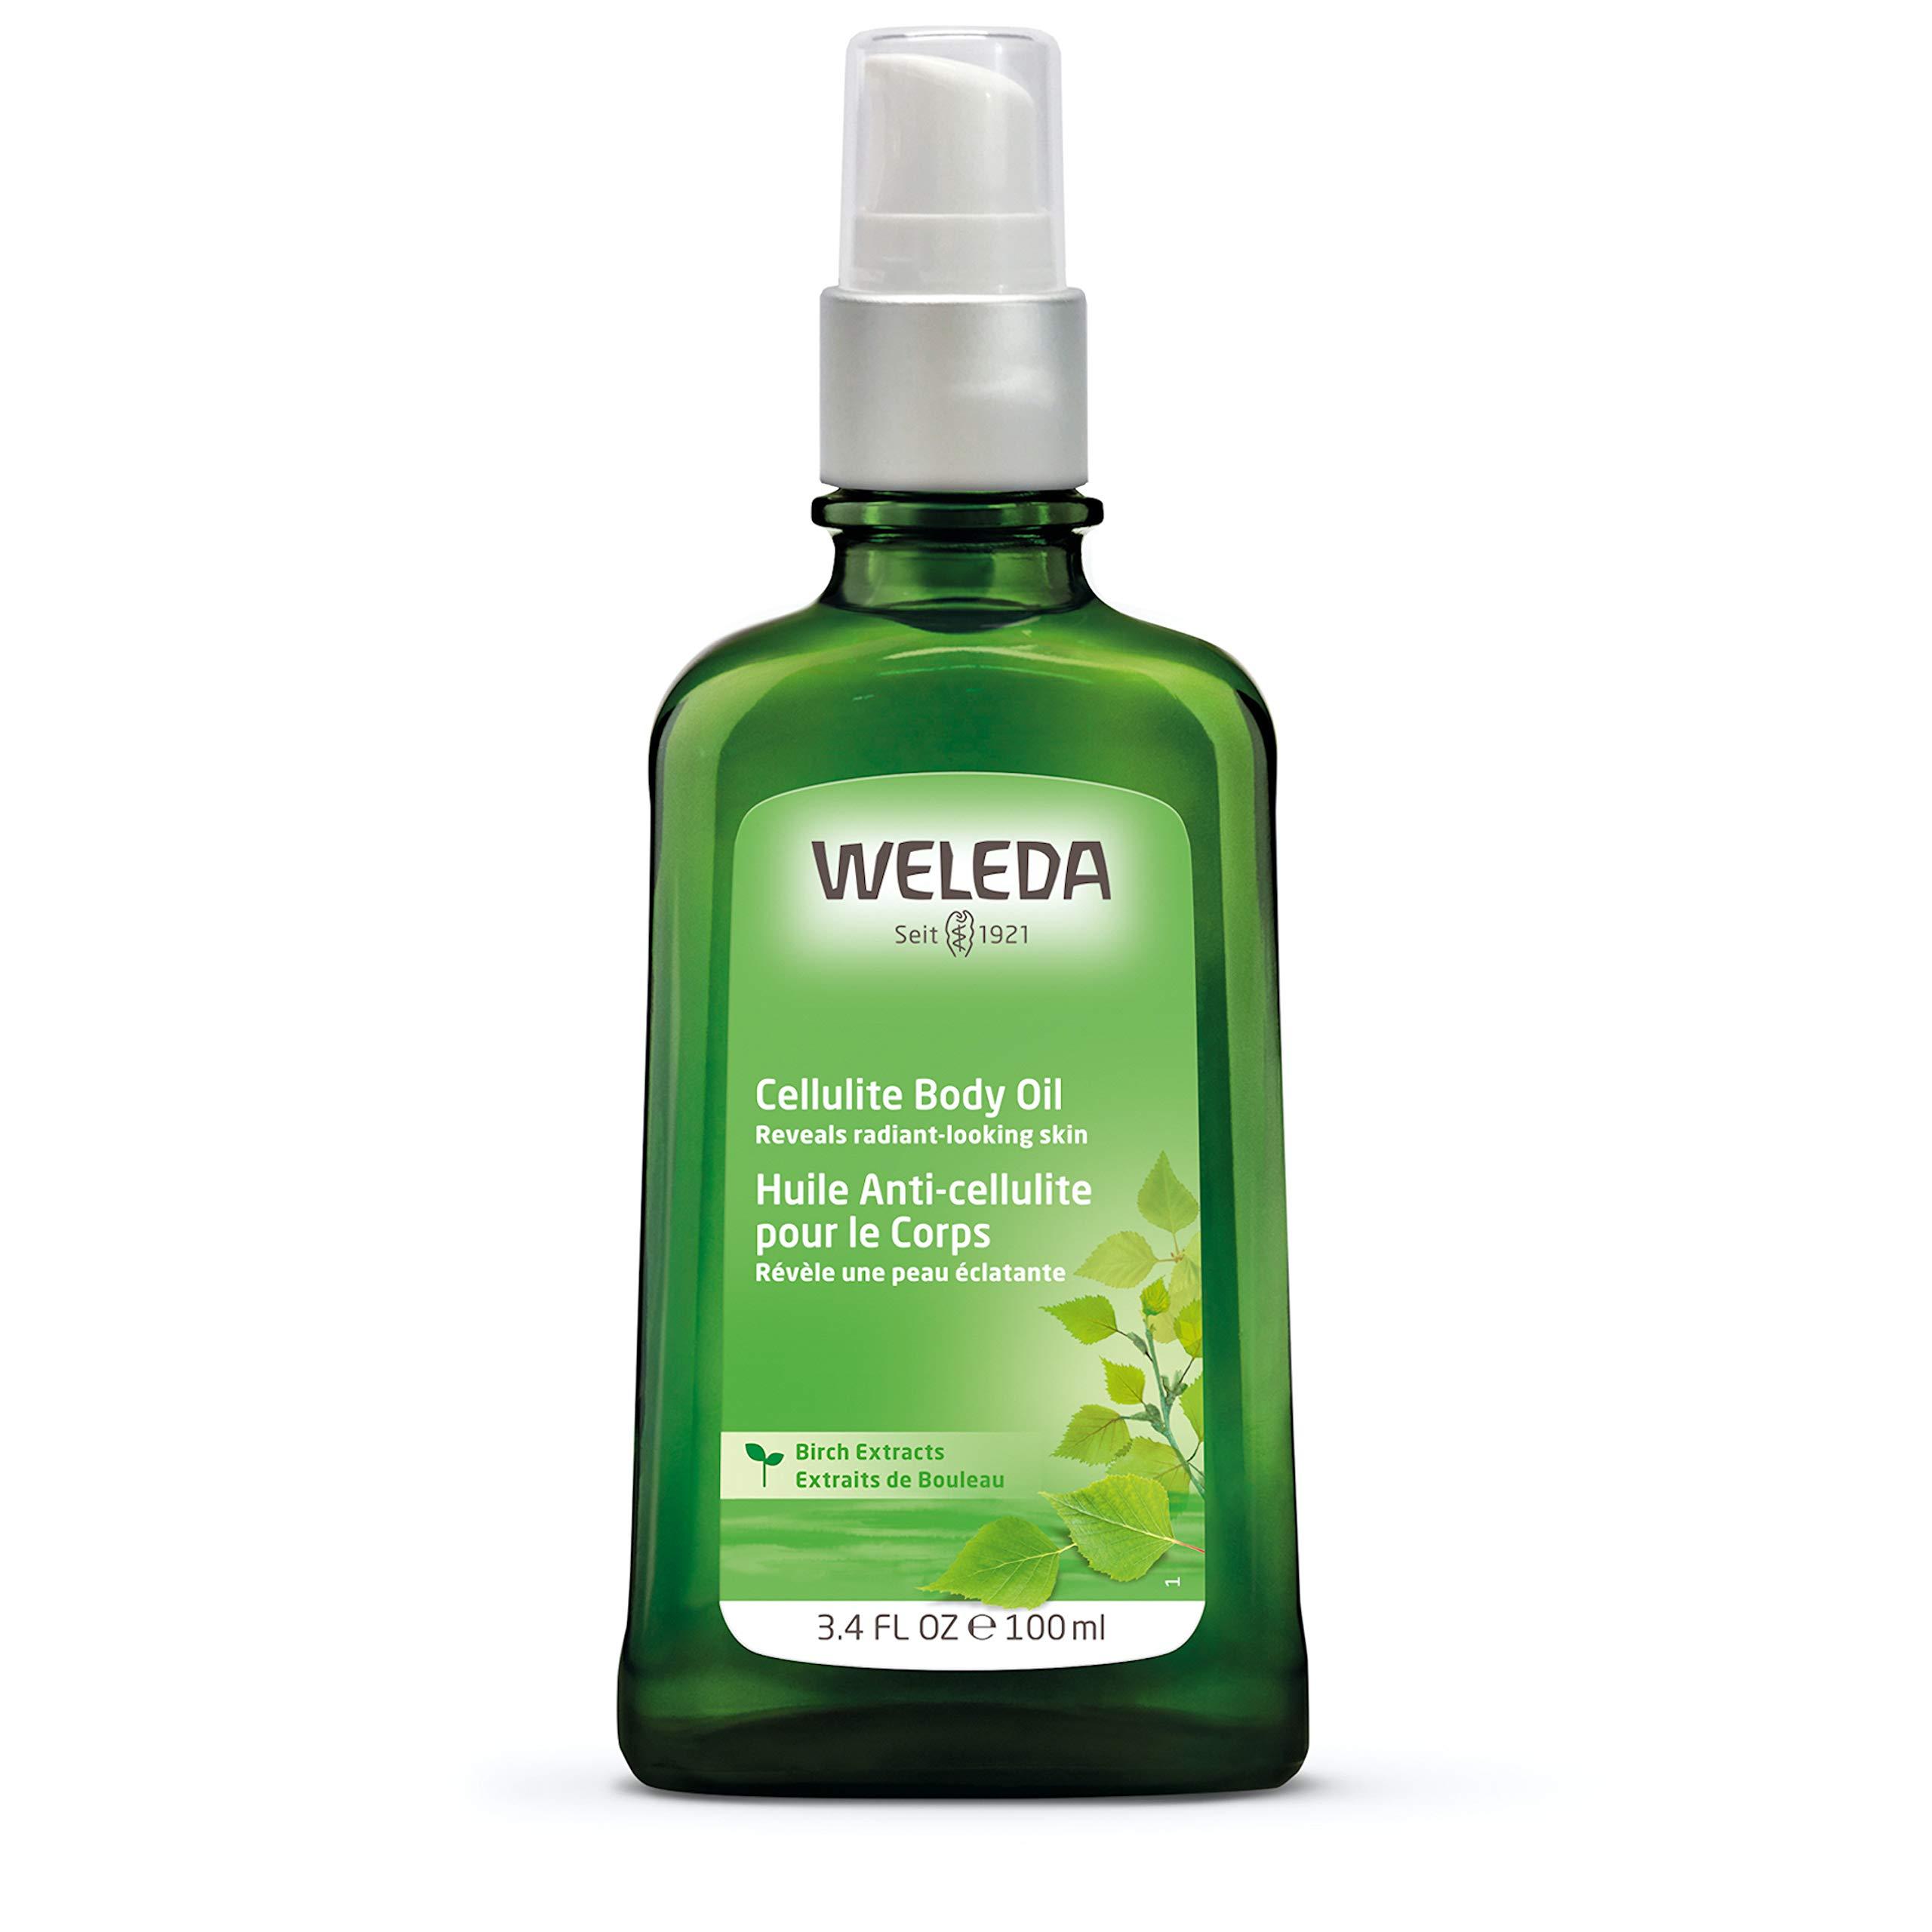 Weleda Cellulite Body Oil, 3.4 Fl Oz